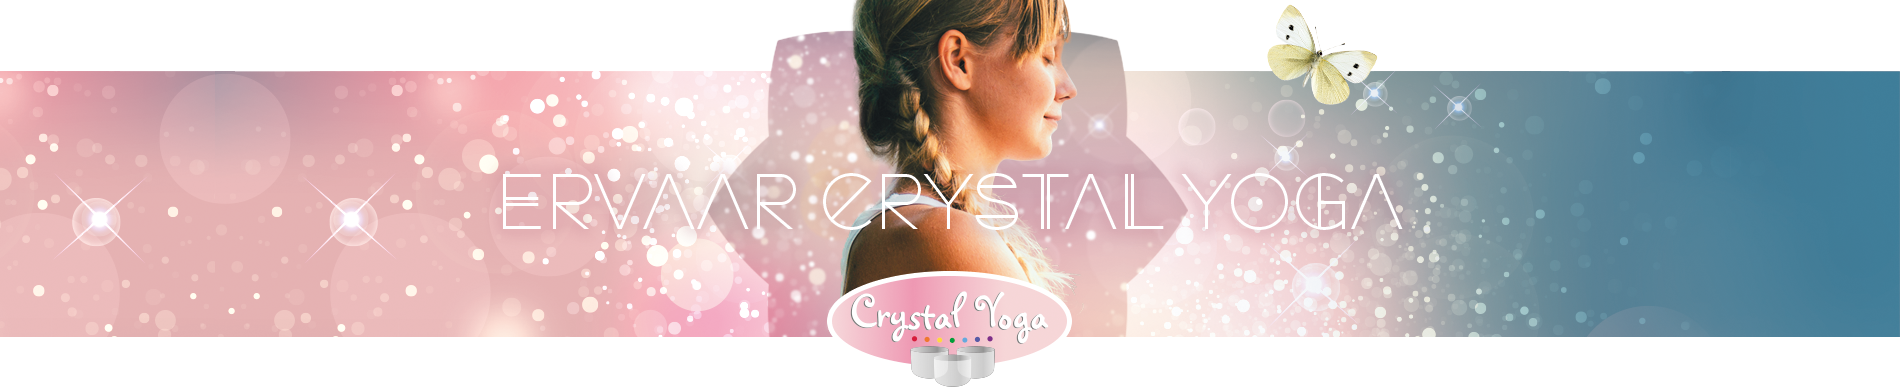 header-crystalyoga-1900px